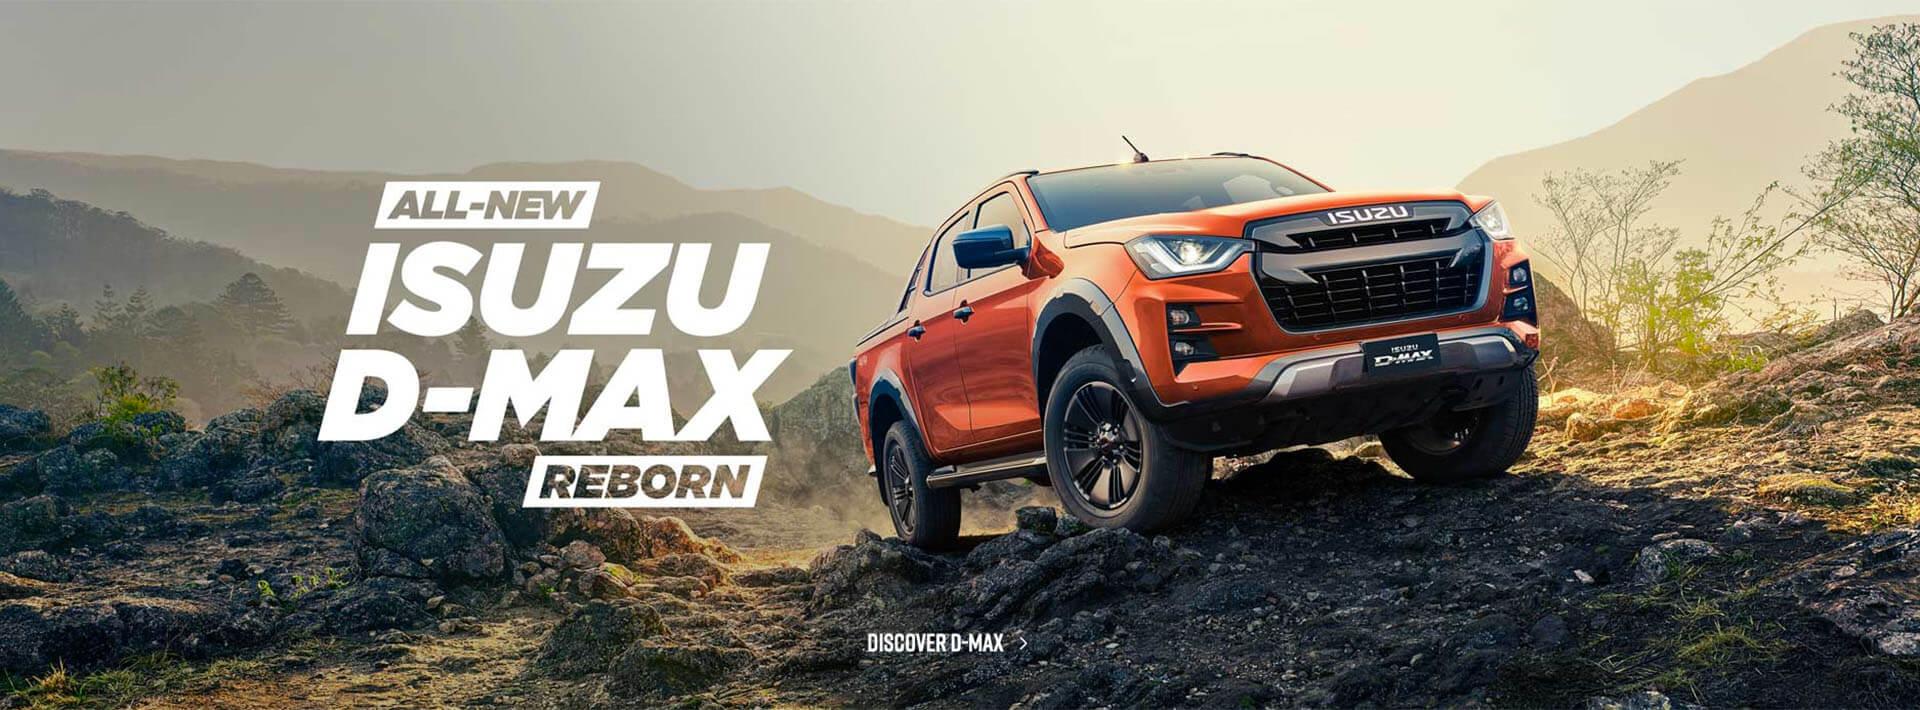 The All-New Isuzu D-MAX reborn. Discover more.